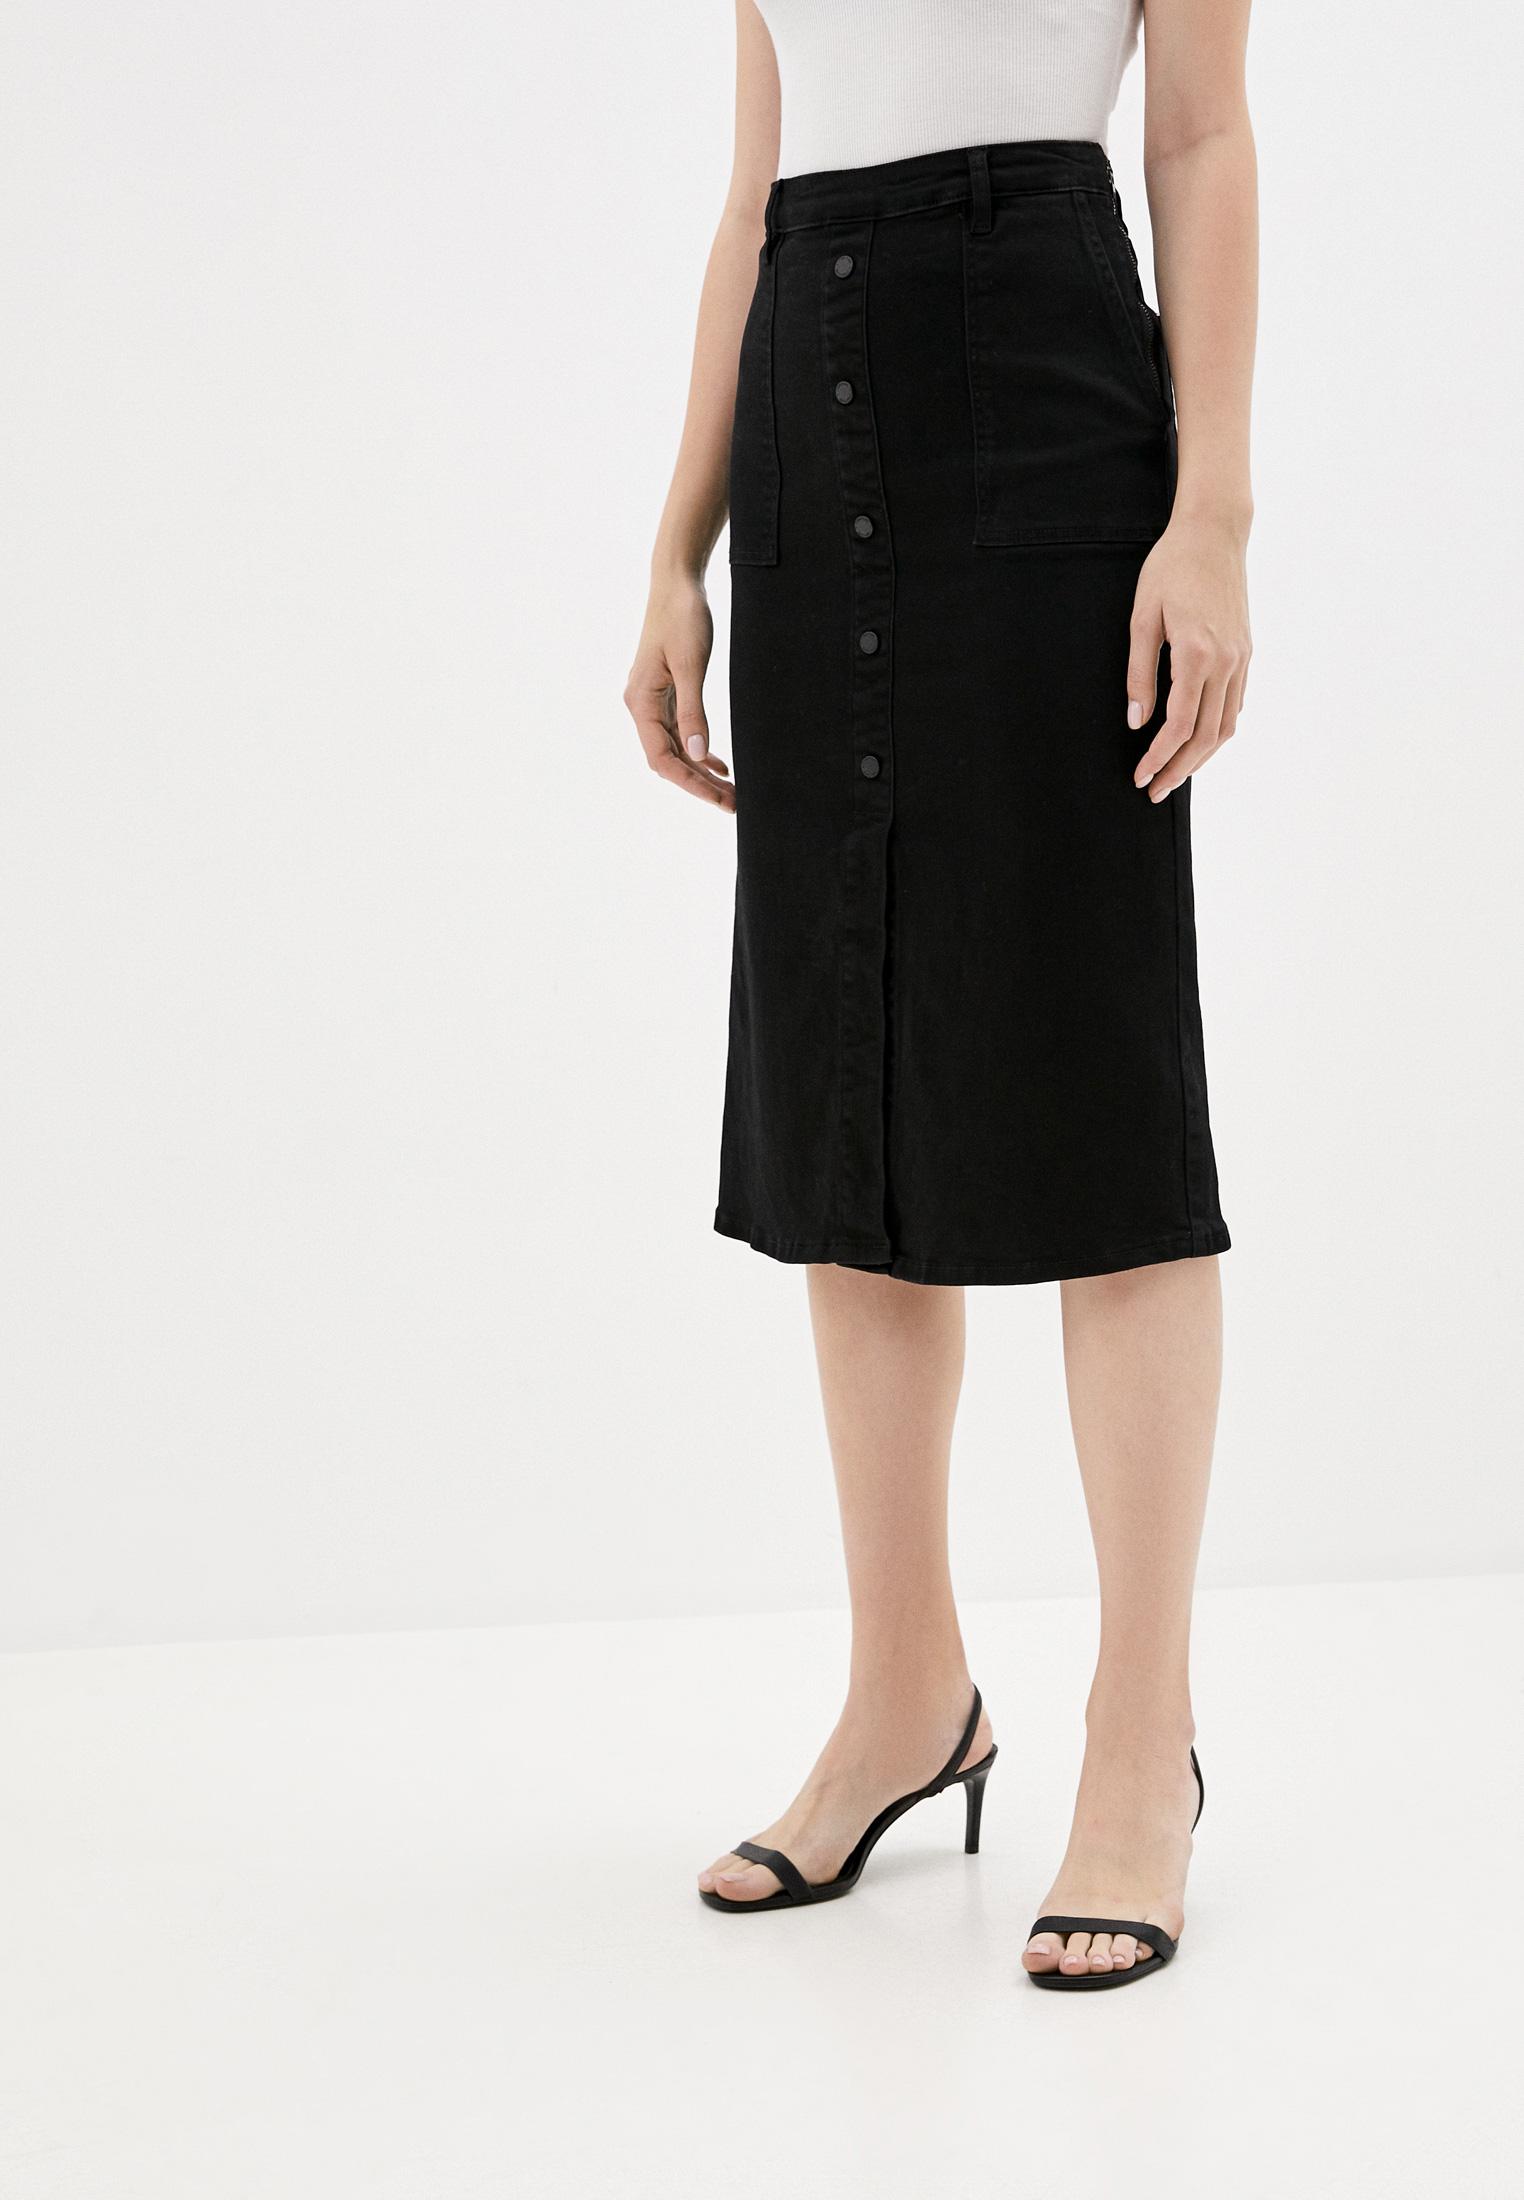 Прямая юбка Finn Flare (Фин Флаер) A19-15010